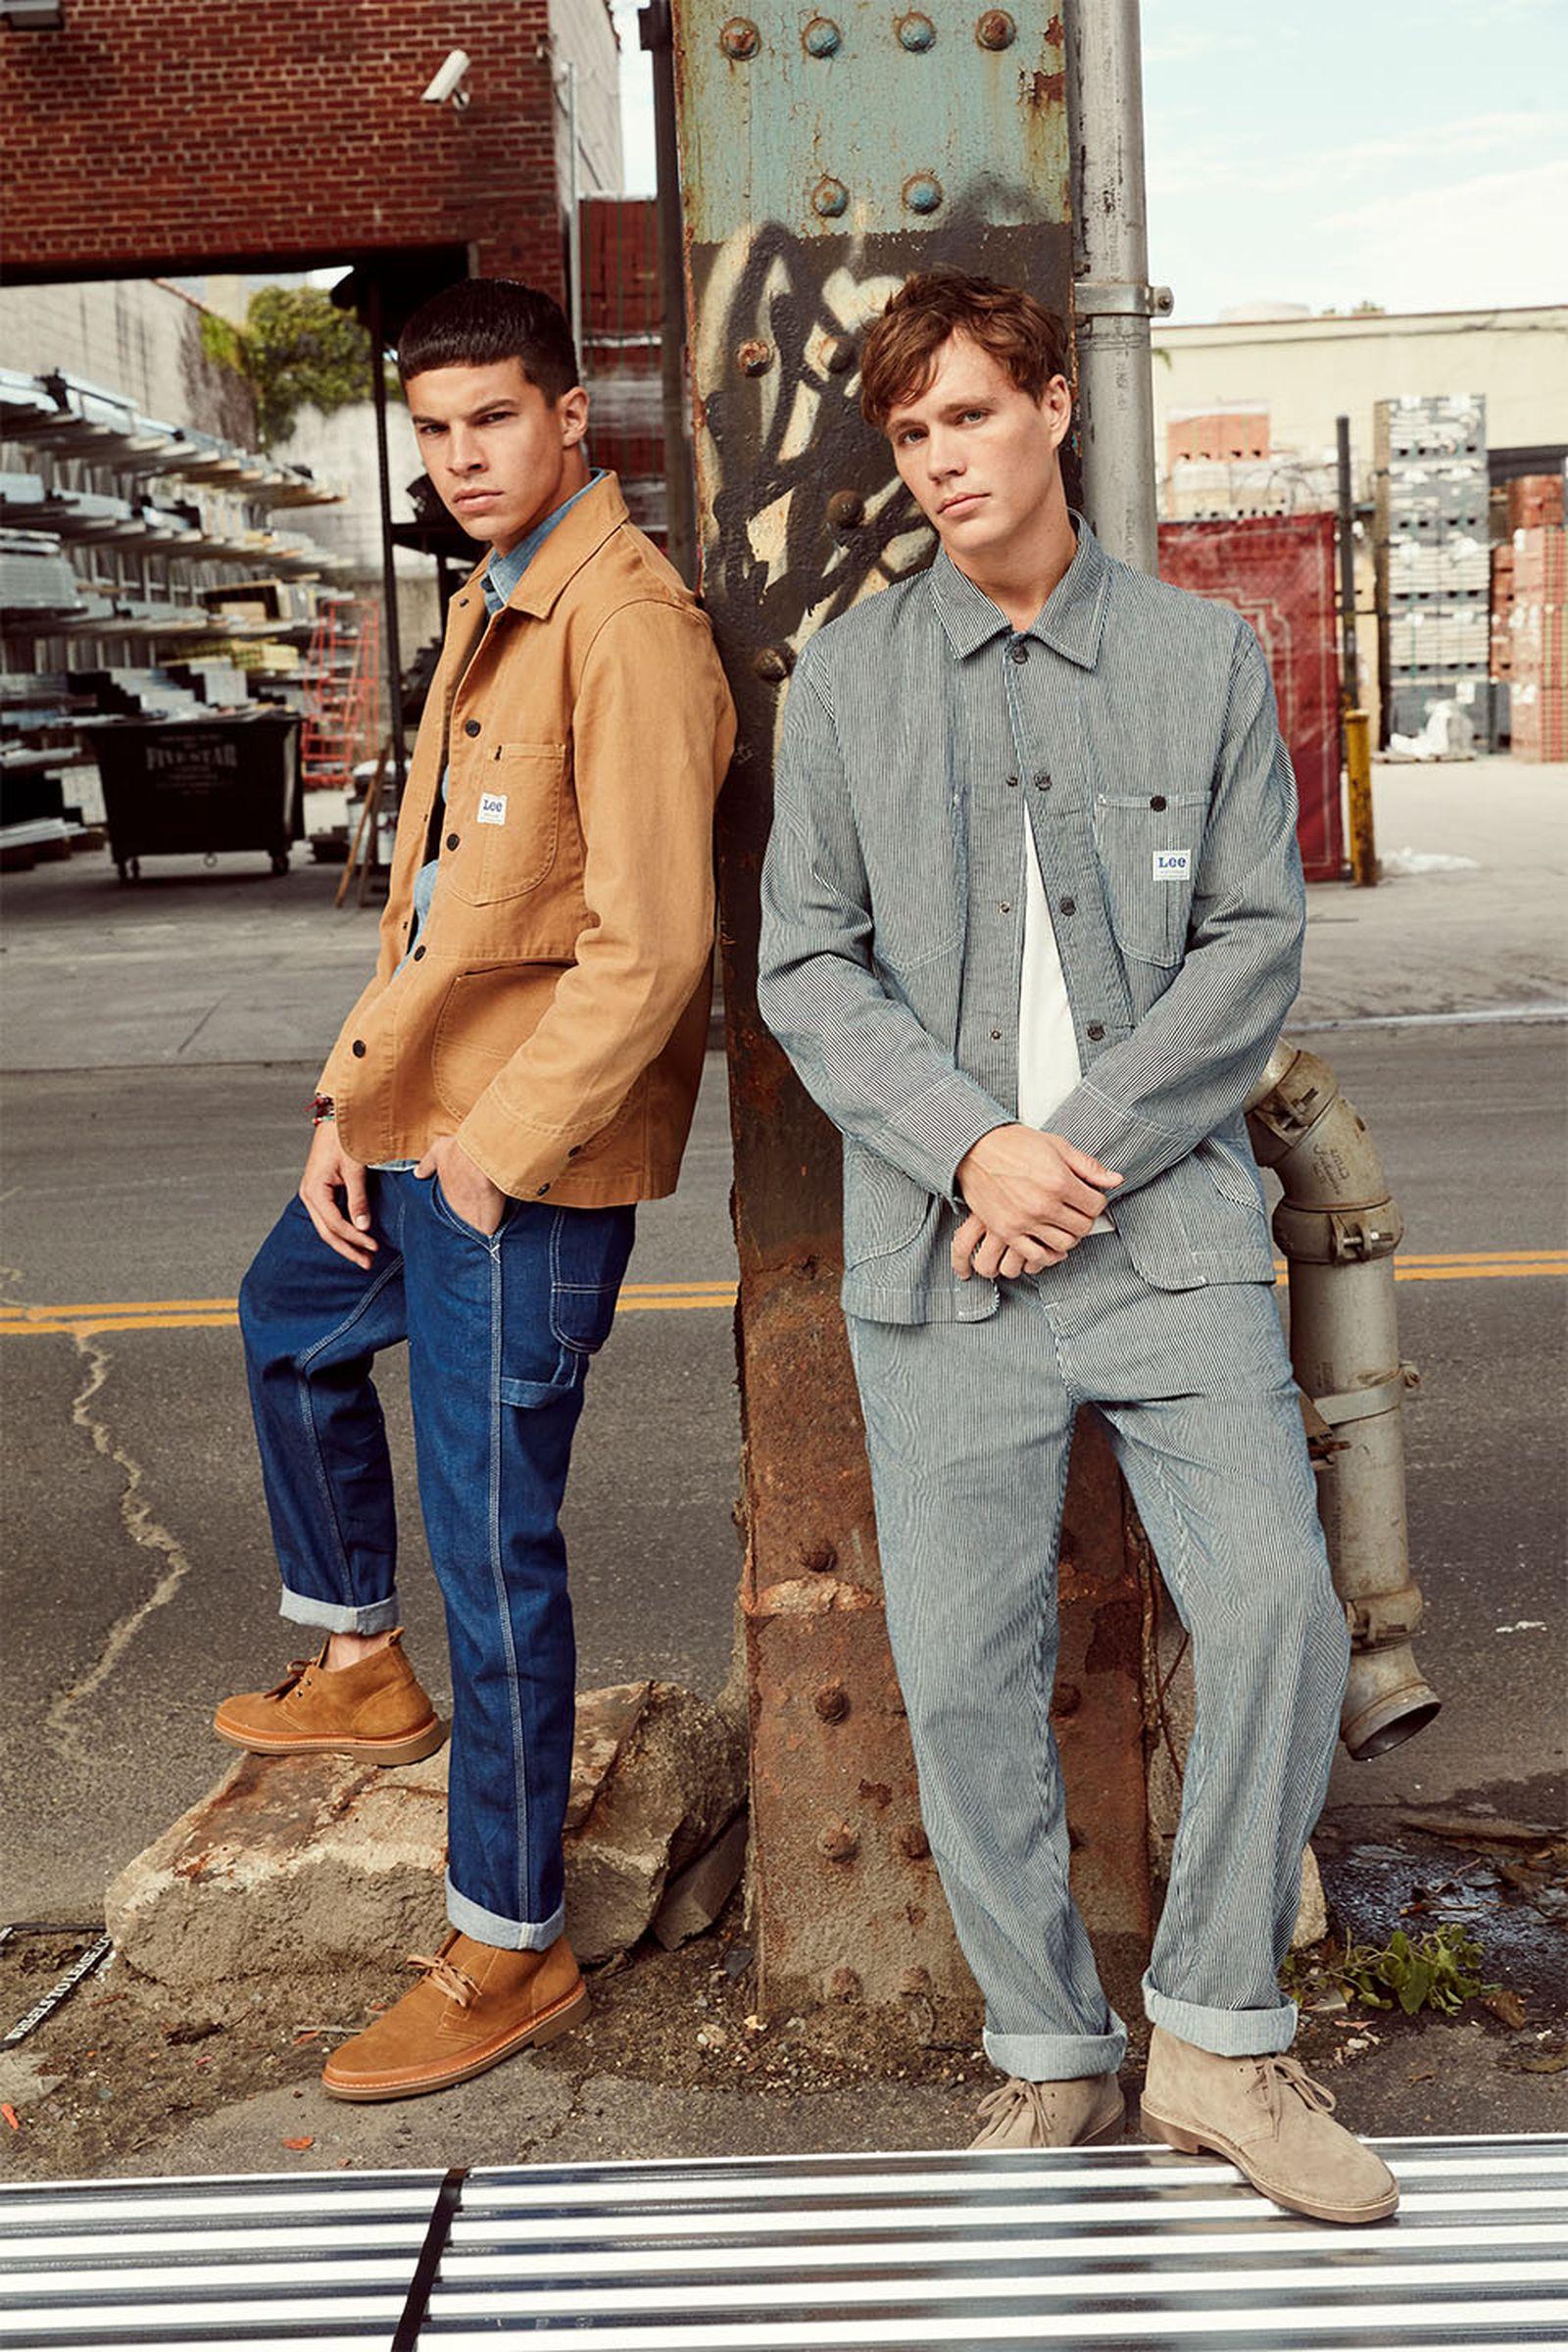 Lee Jamel Shabazz Lee Jeans NYC Street Style